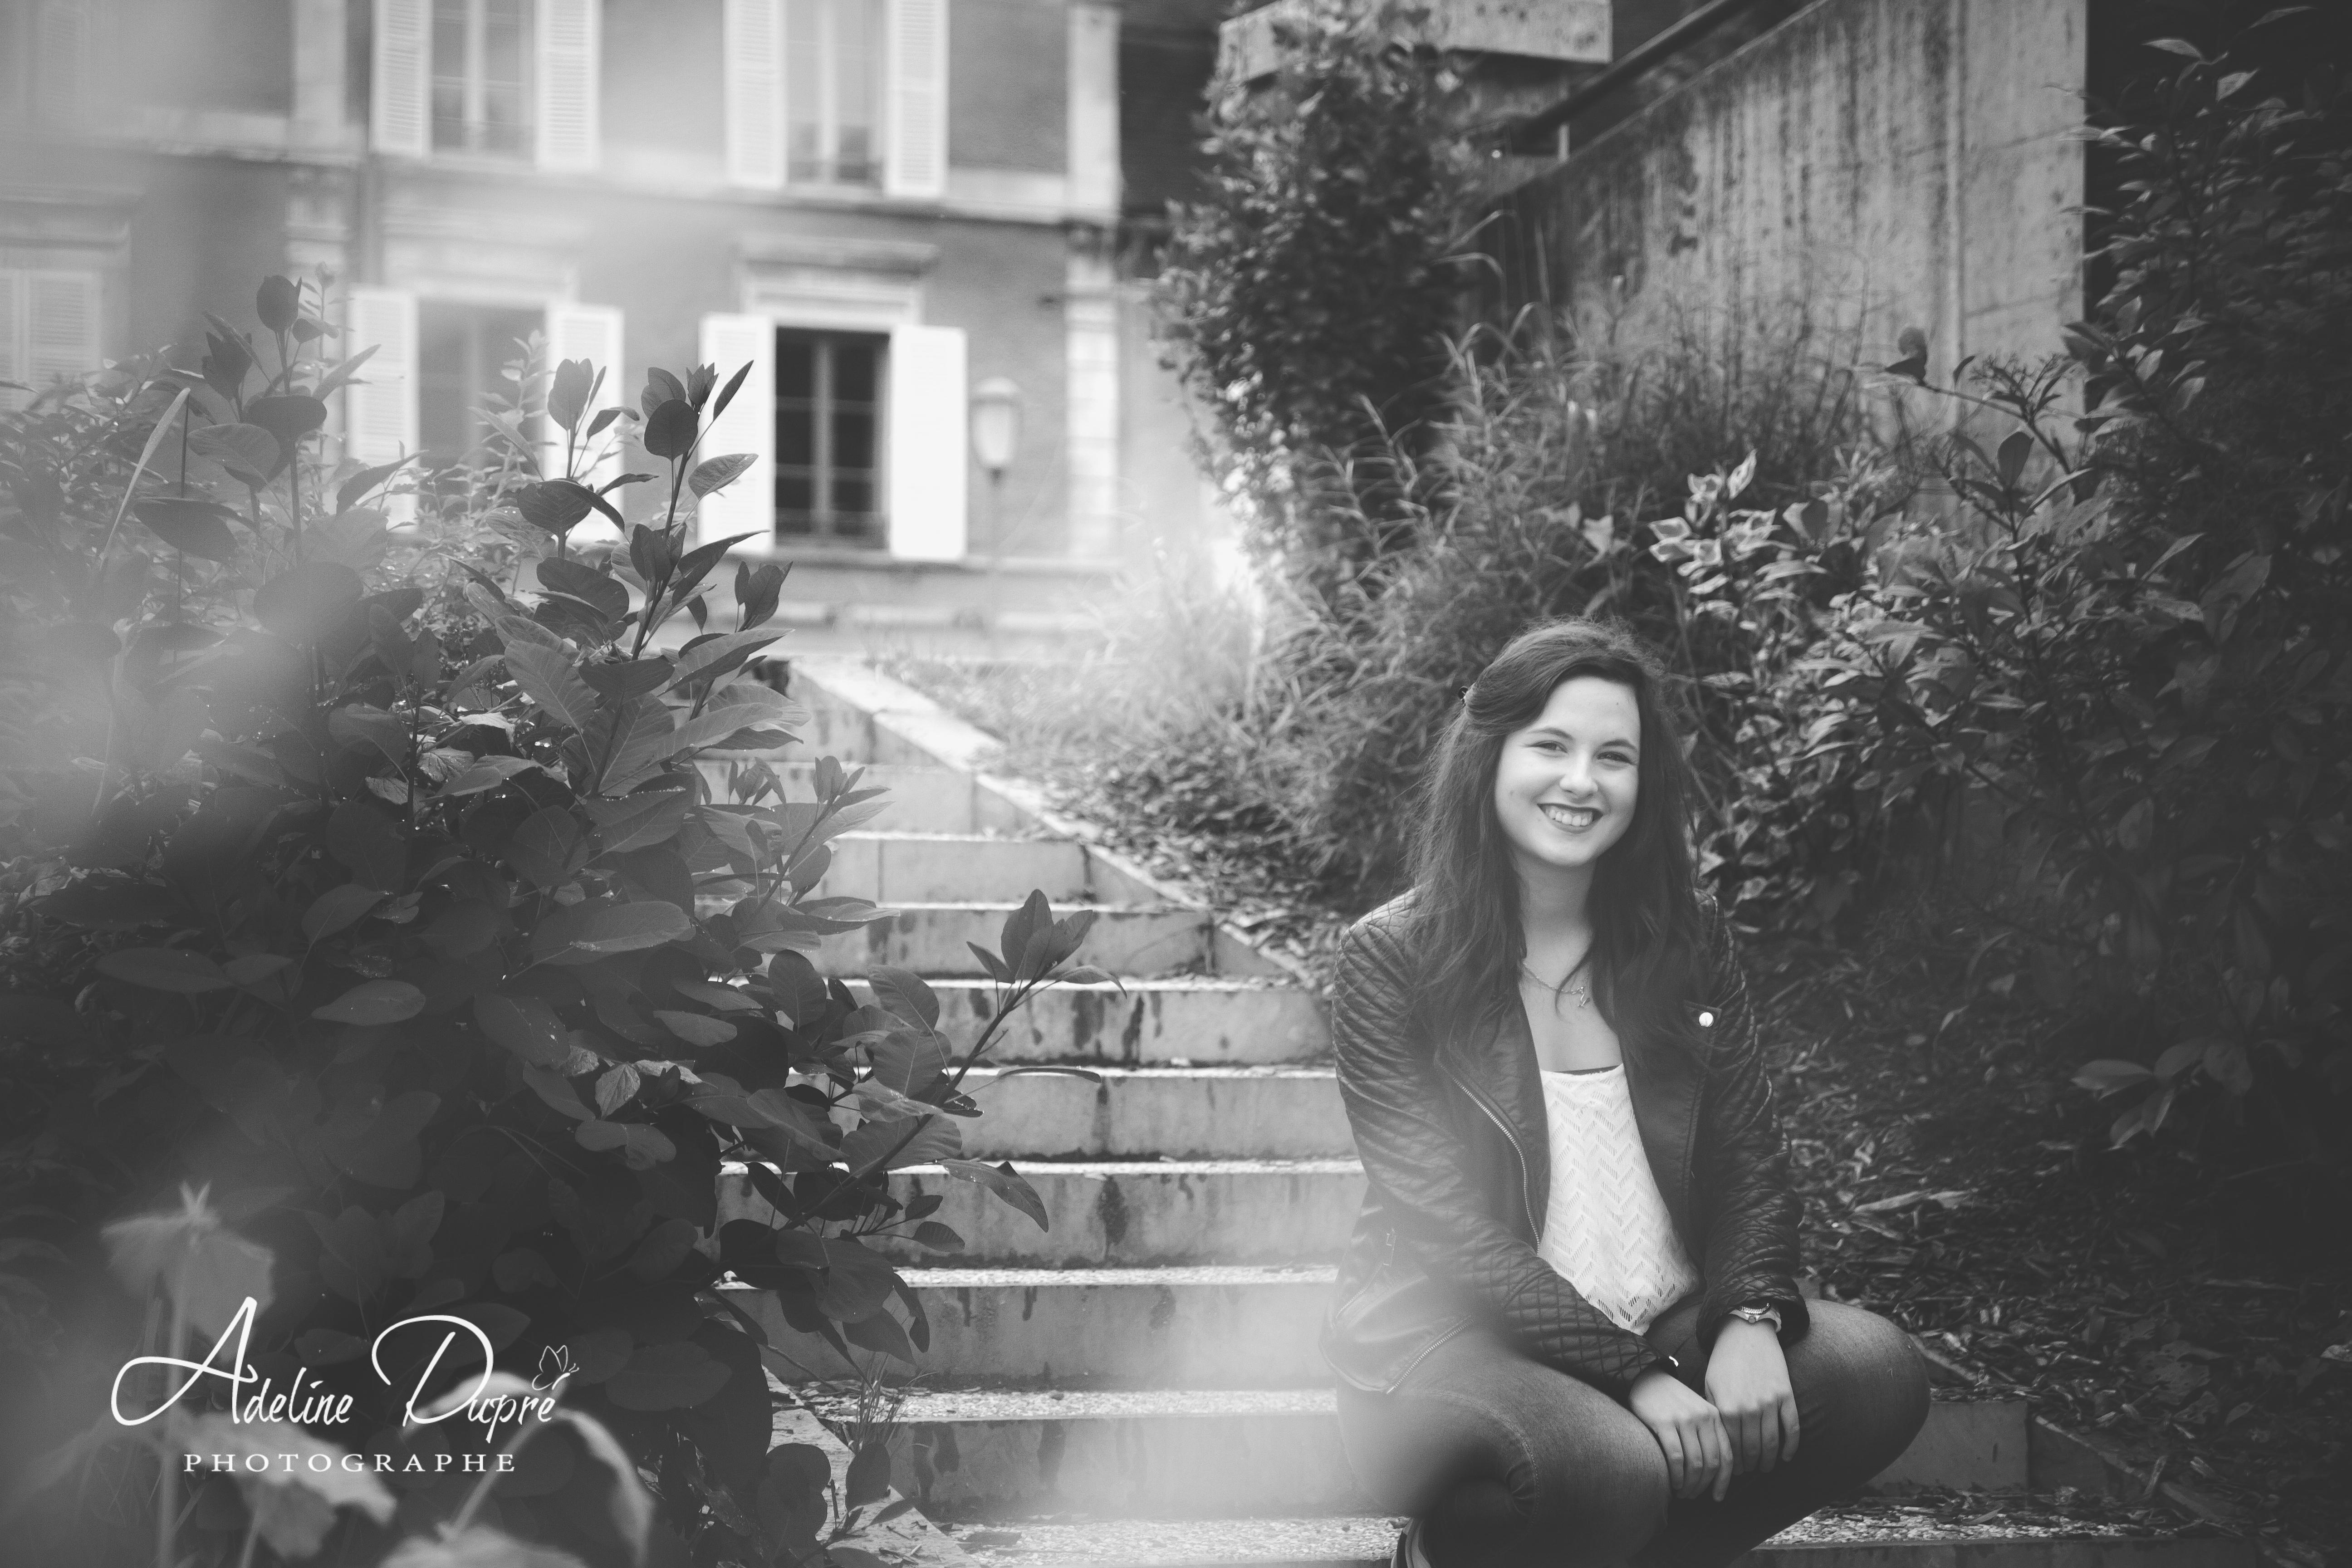 Adeline_Dupré_photographe_Yonne-3200-2